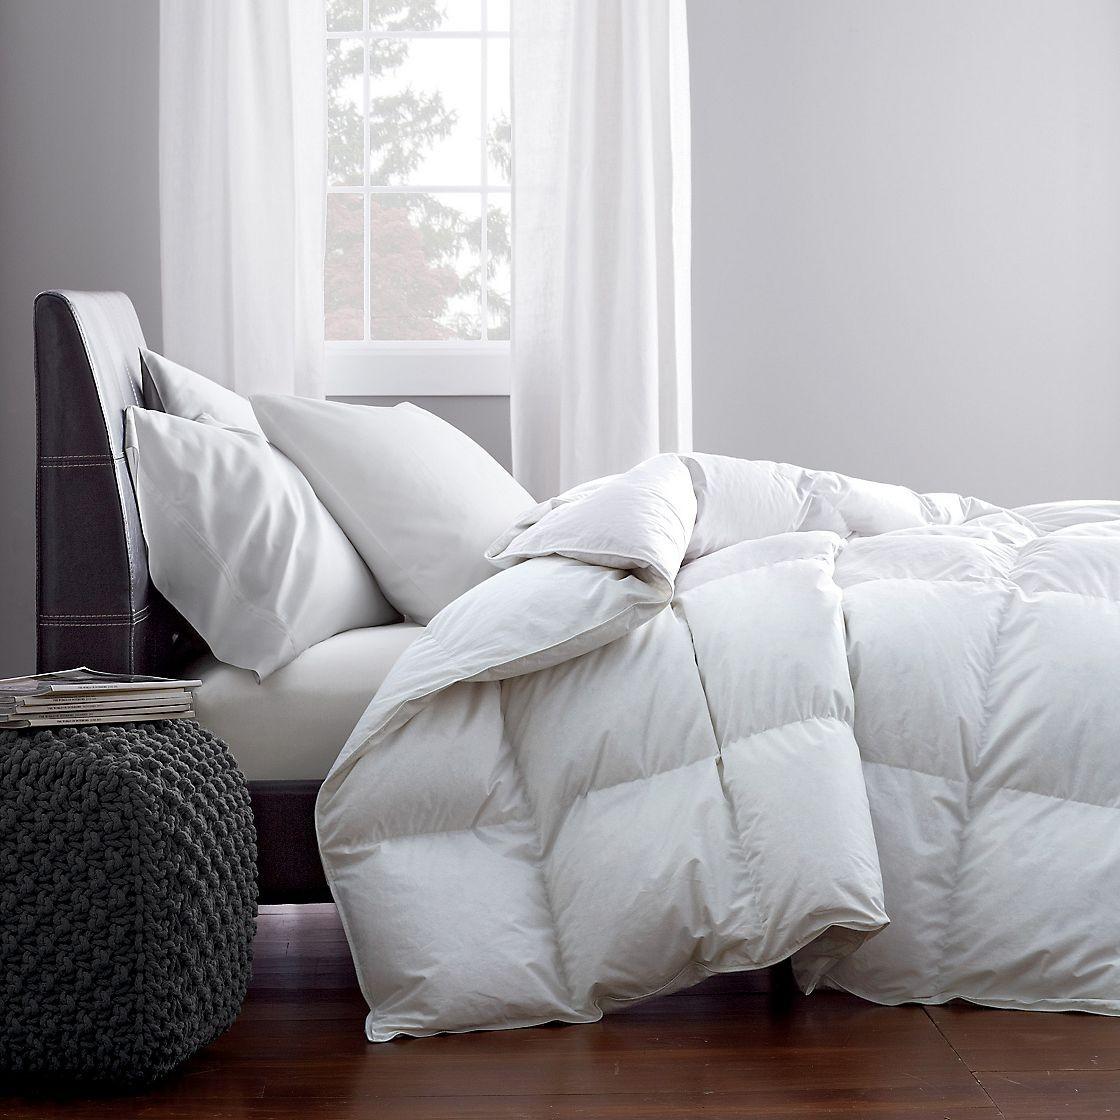 home_apparel_s_classic_goose_down_comforter.jpg